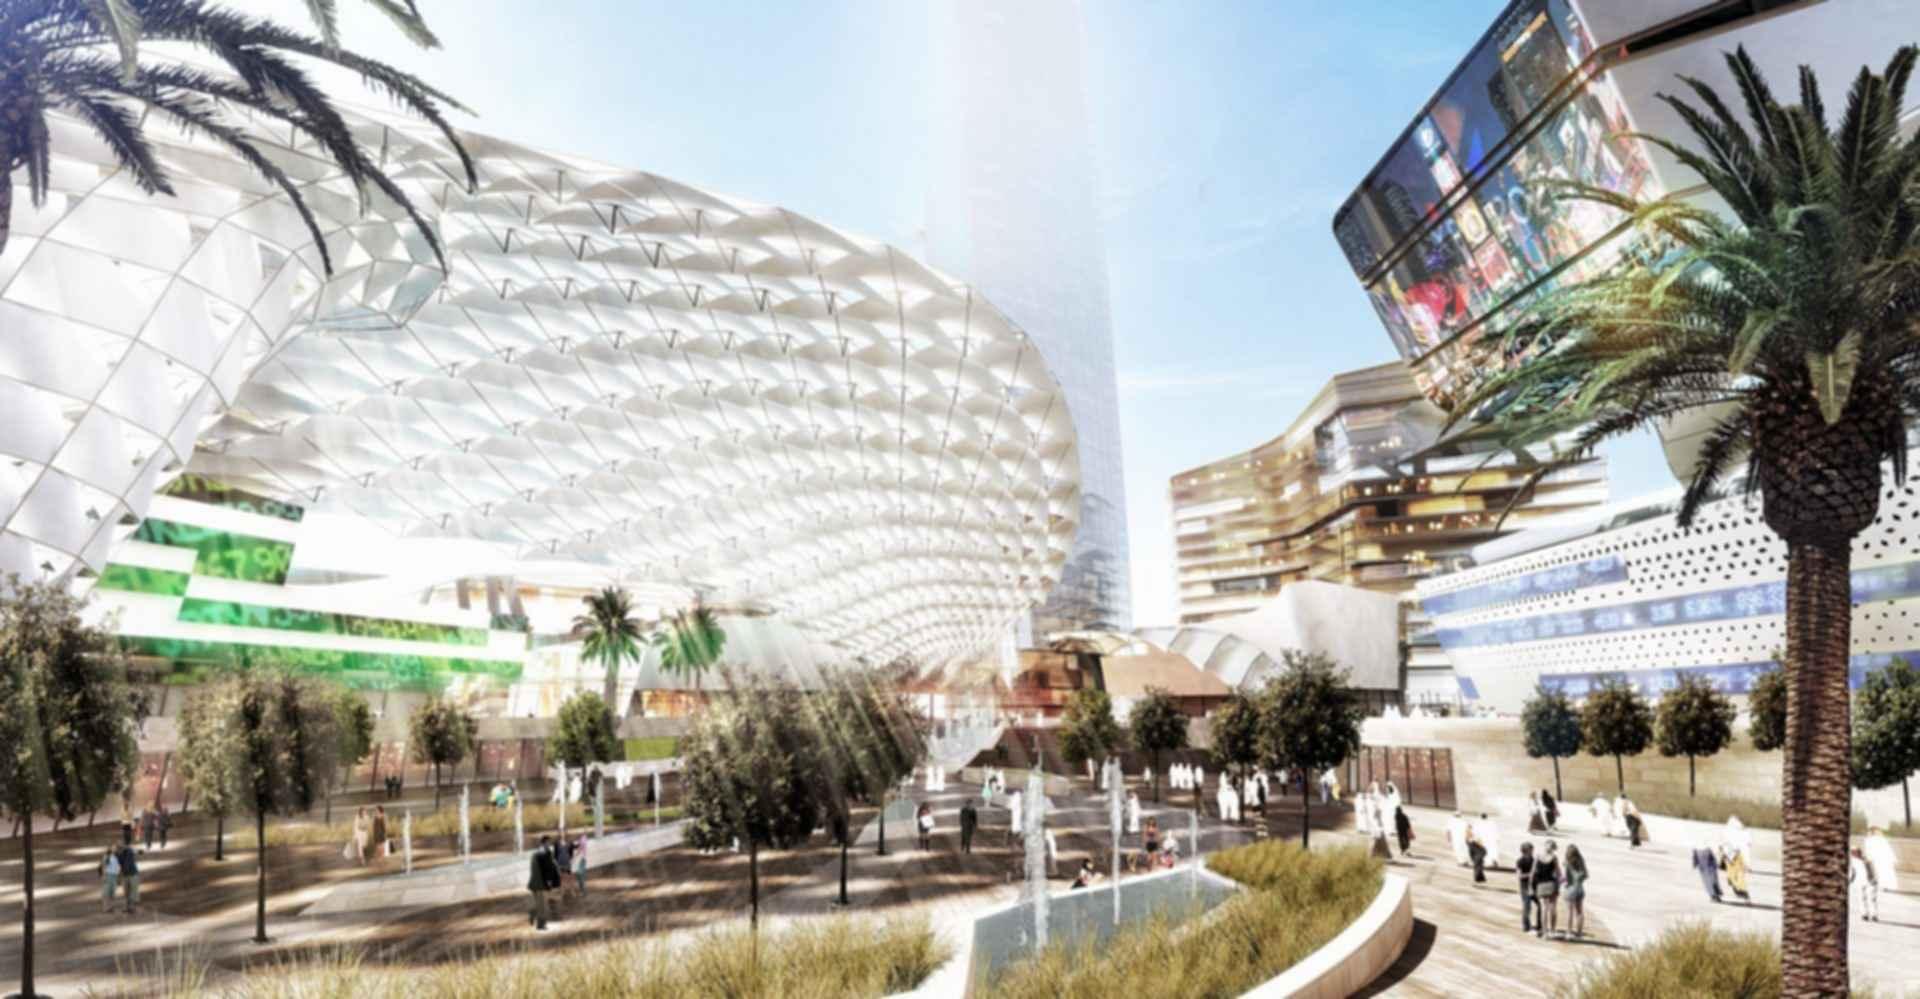 Dubai Square - Concept Design